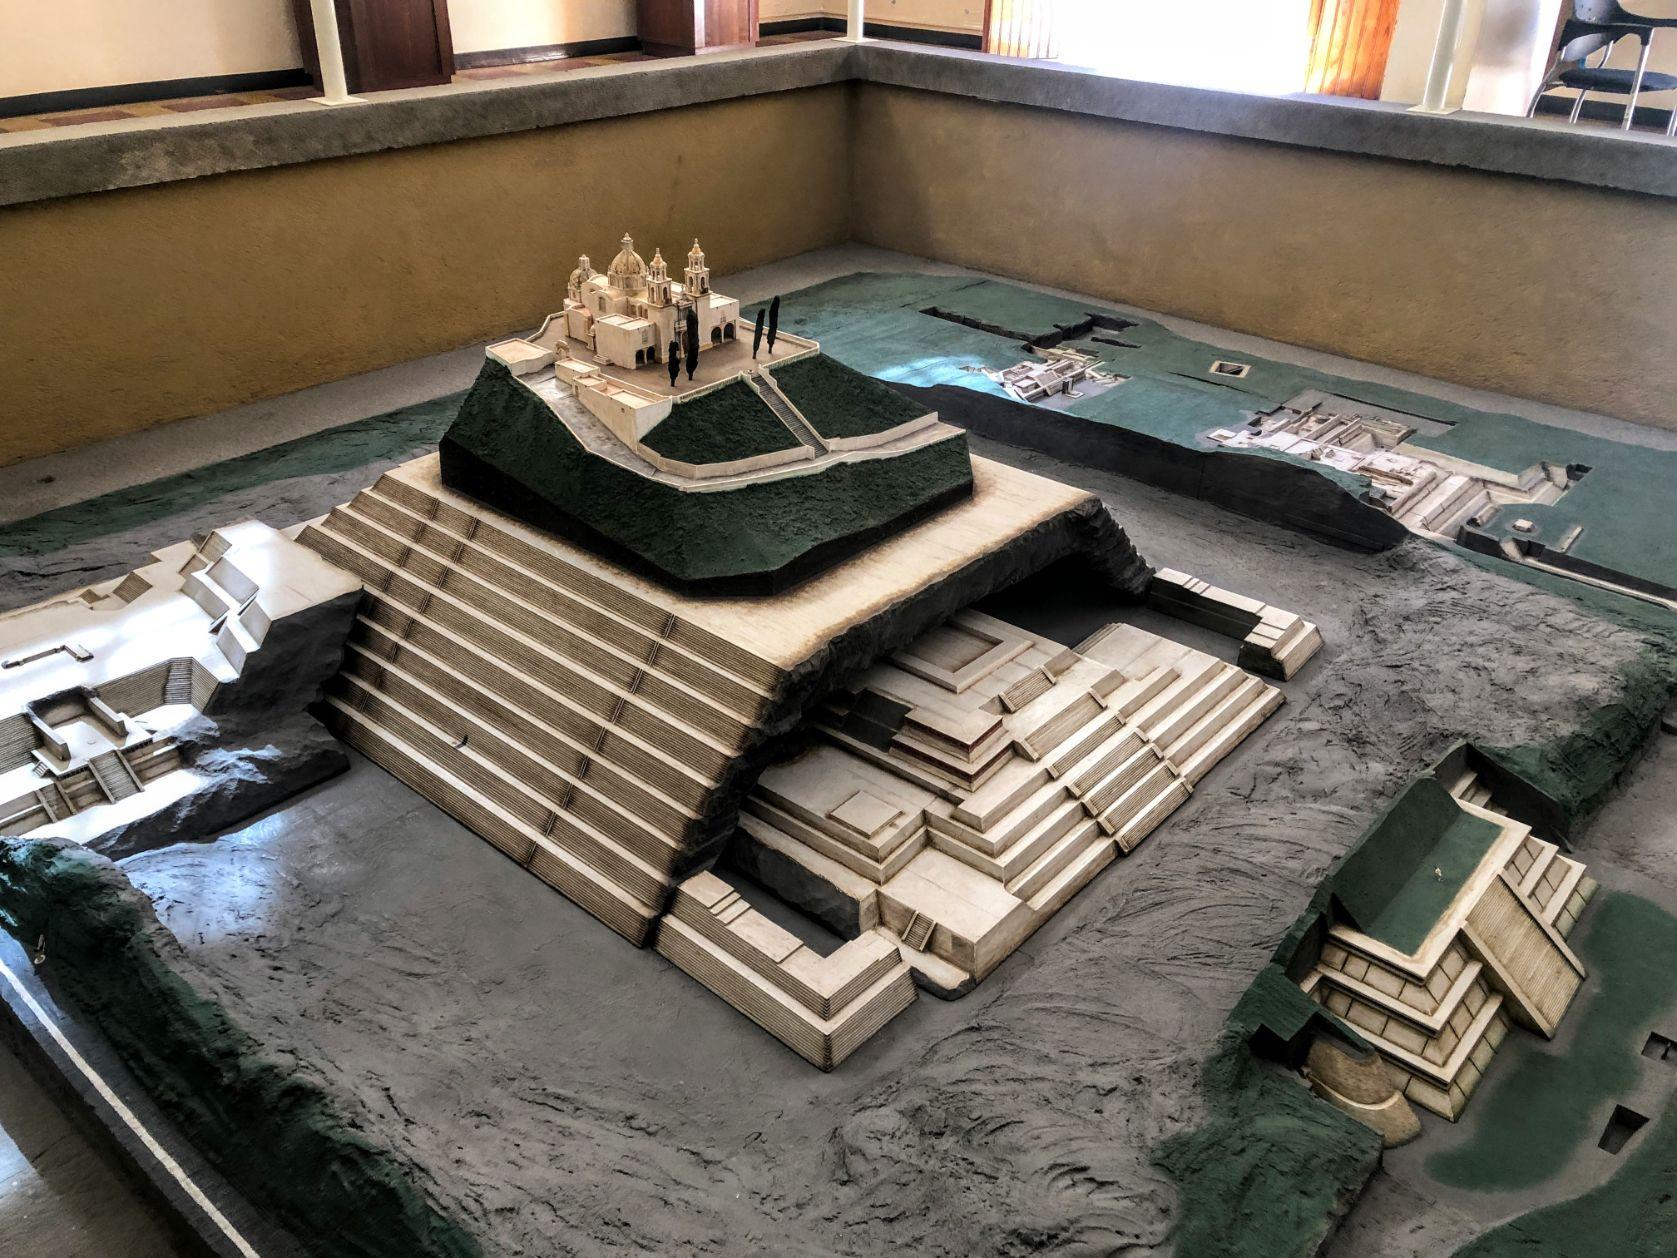 Replica of the Cholula ruins in the Cholula Pyramid museum